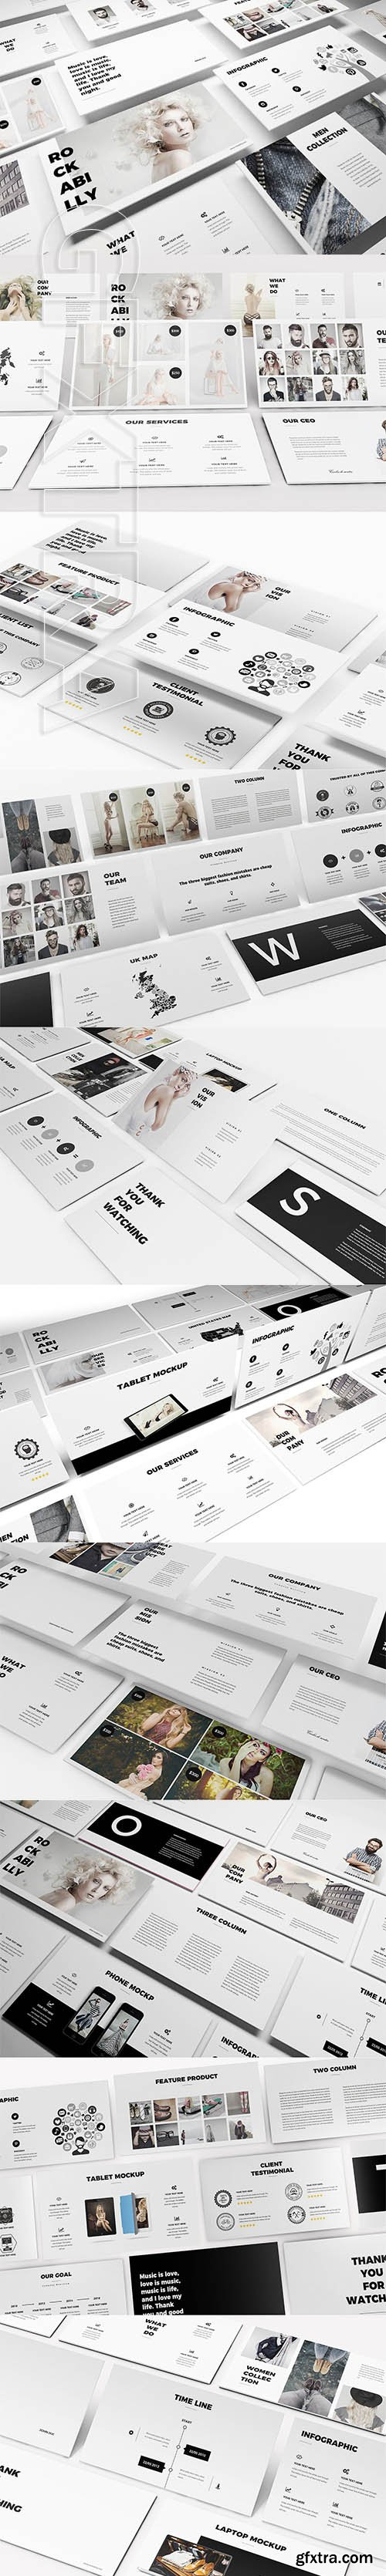 CreativeMarket - Fashion Google Slides Template 2442532